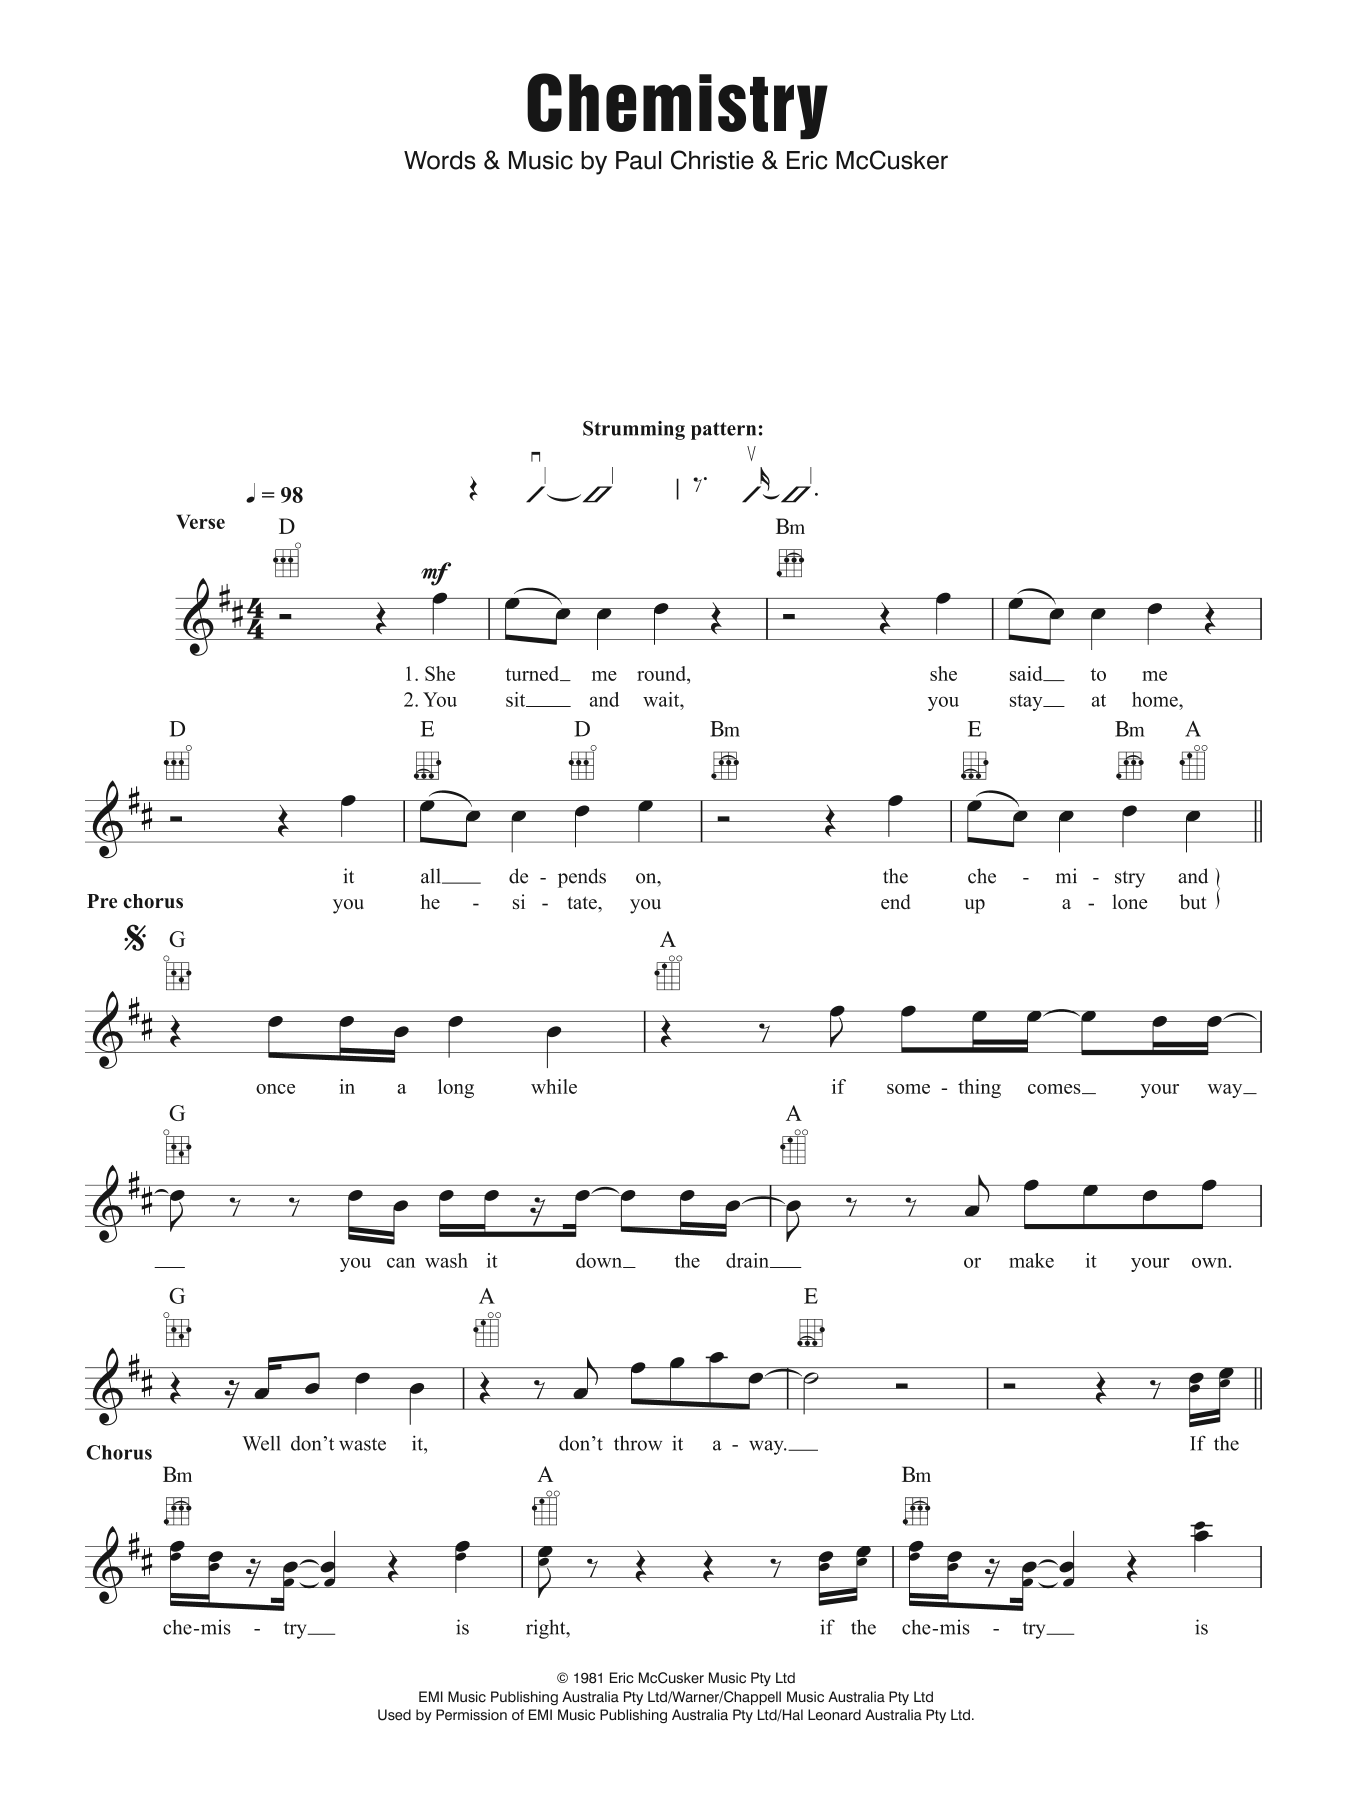 Chemistry Sheet Music